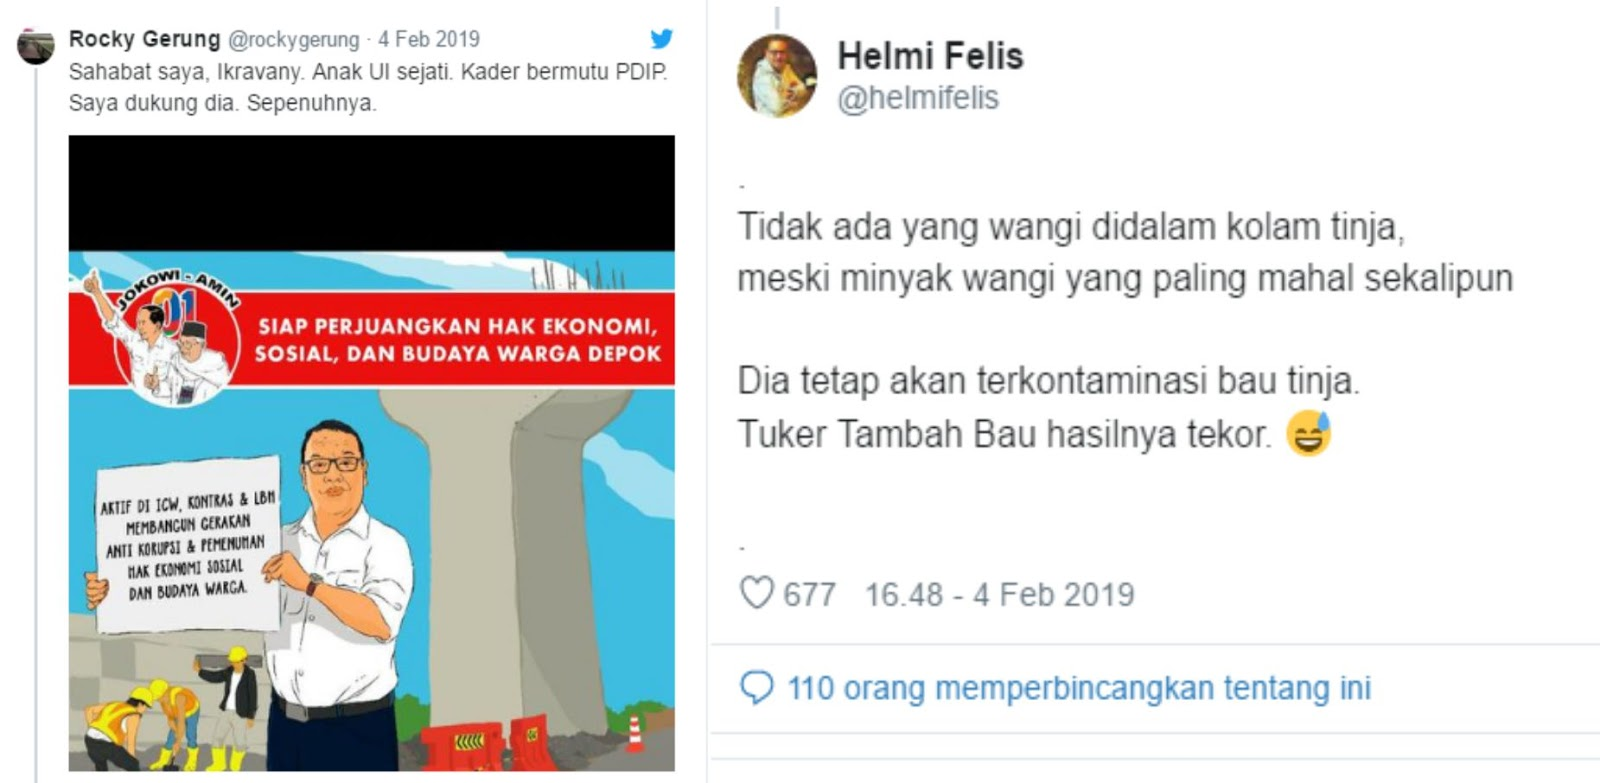 "Rocky Dukung Caleg PDI P, Netizen: ""Kali ini saya tak sepakat Prof, Tidak ada yang wangi didalam kolam tinja, meski minyak wangi yang paling mahal sekalipun"""